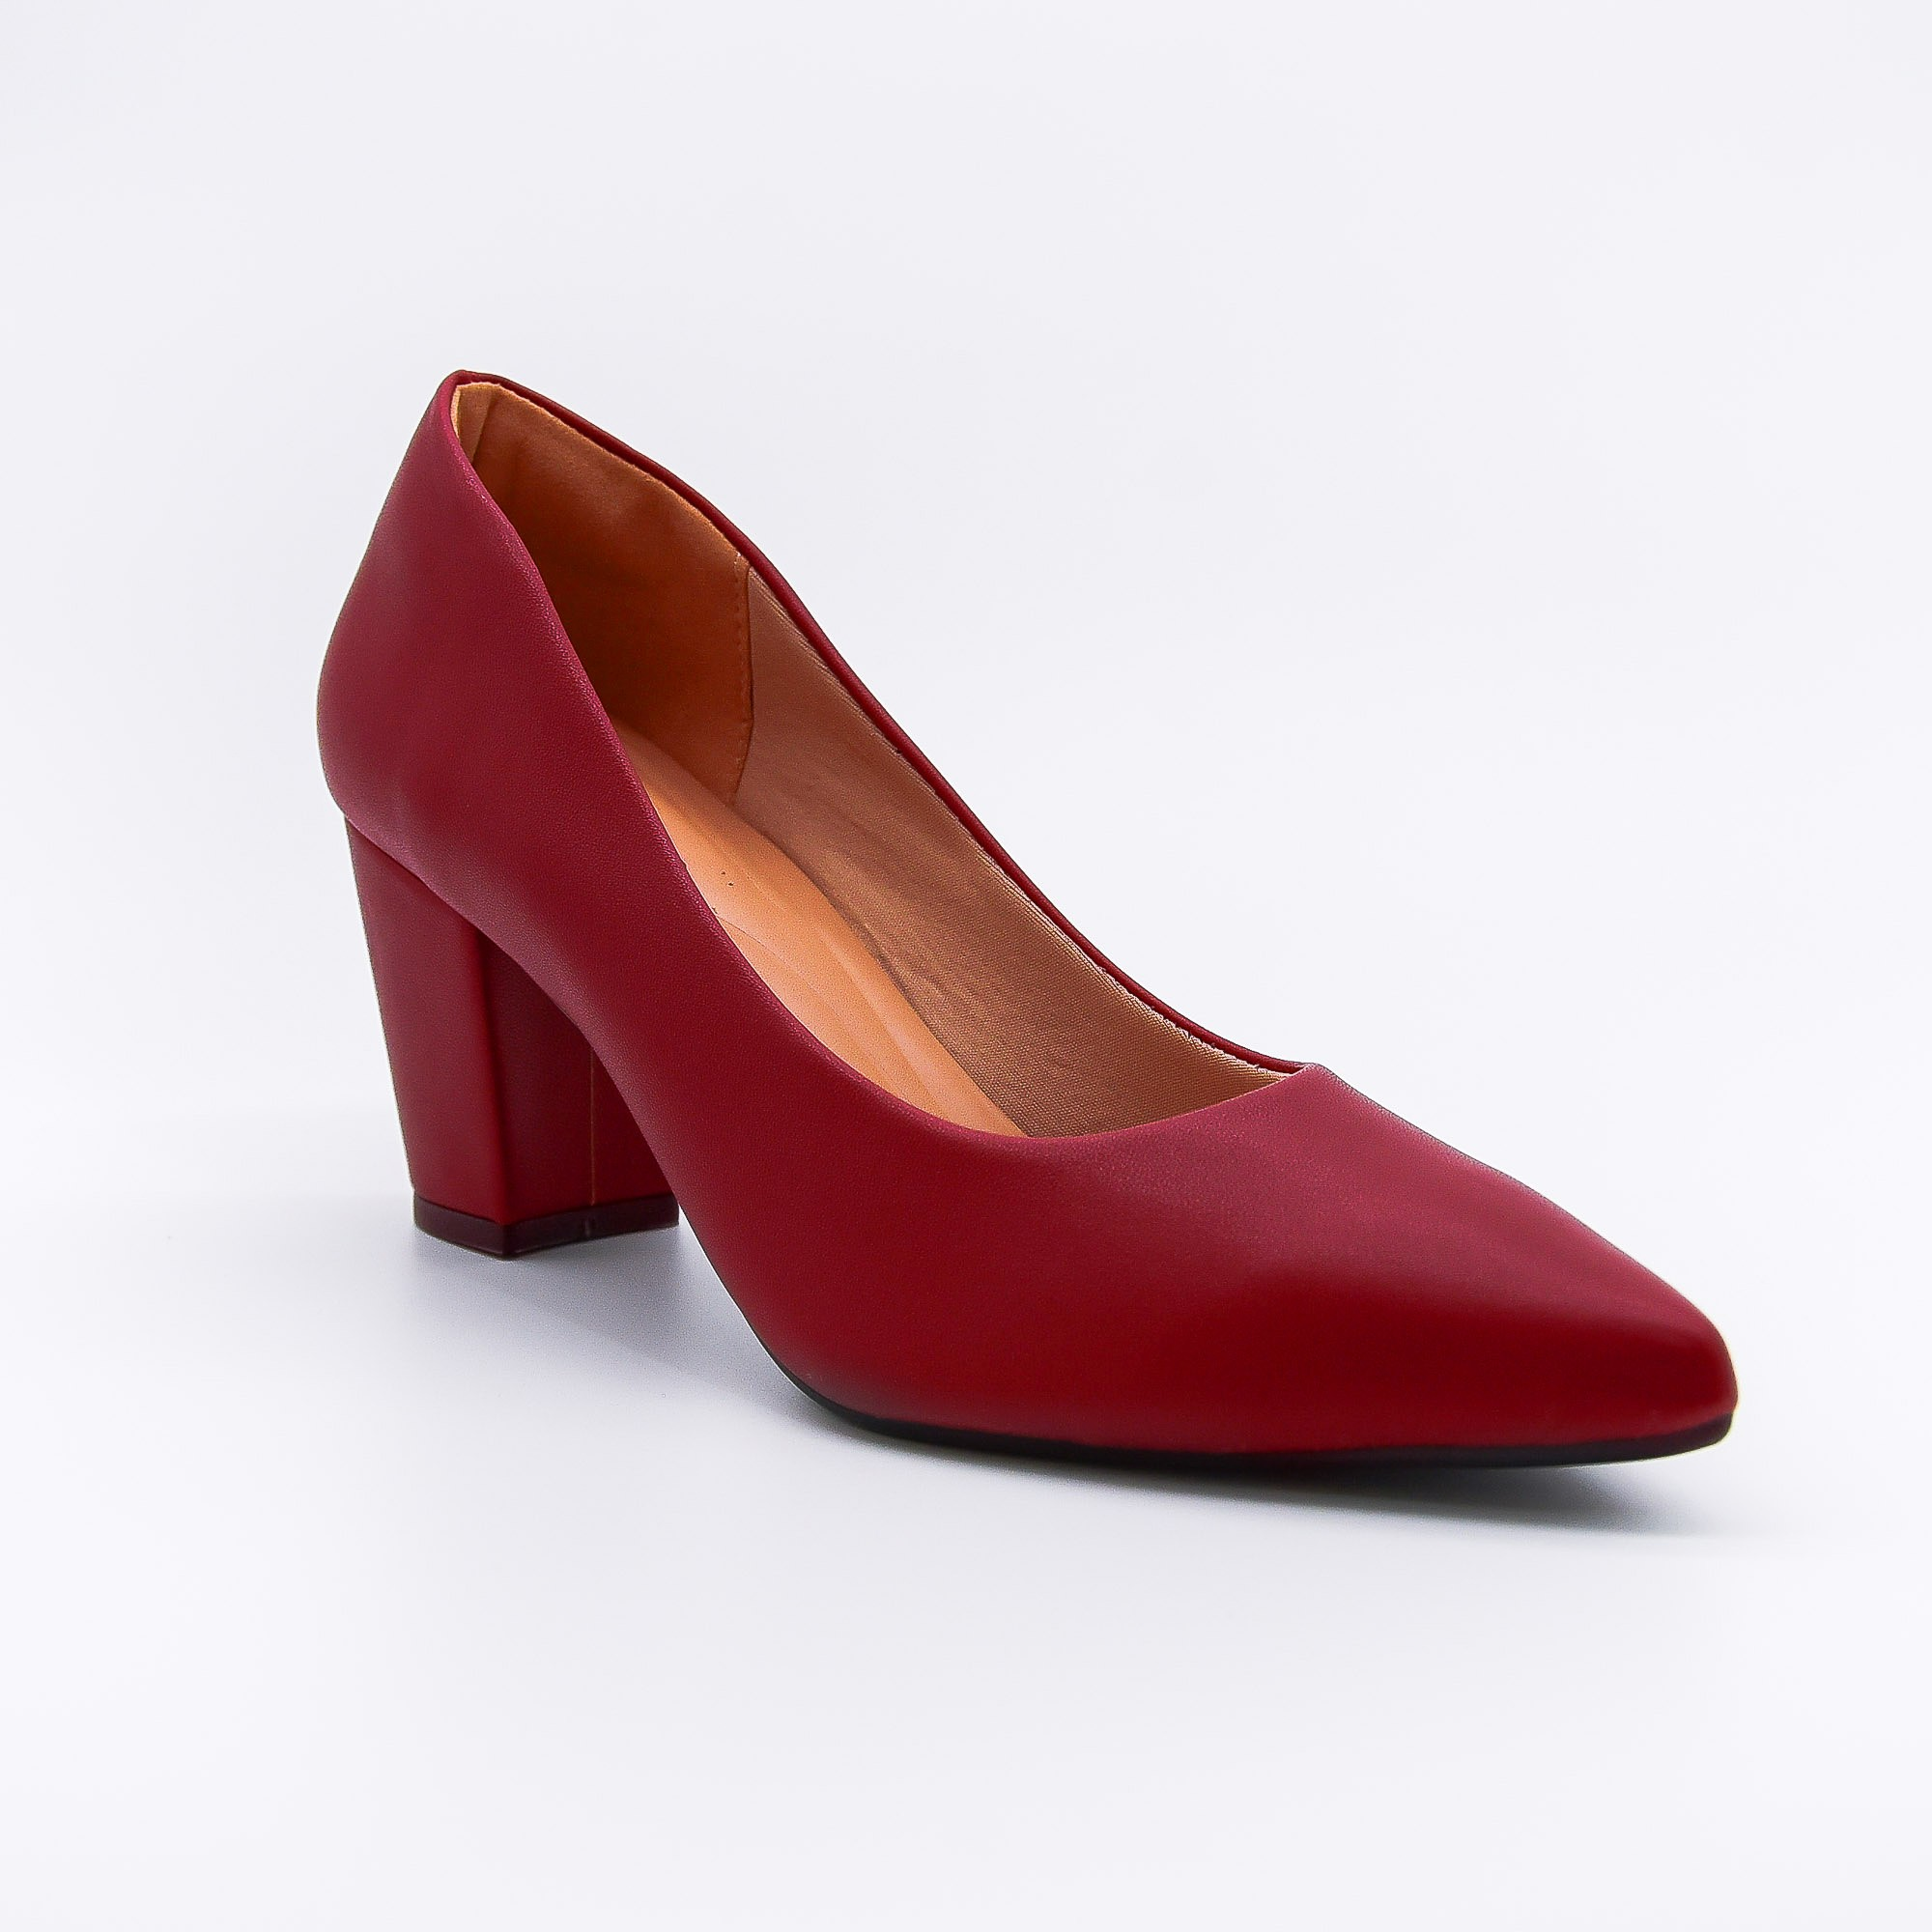 Scarpin vermelho burgundy salto grosso Bendito Sapato